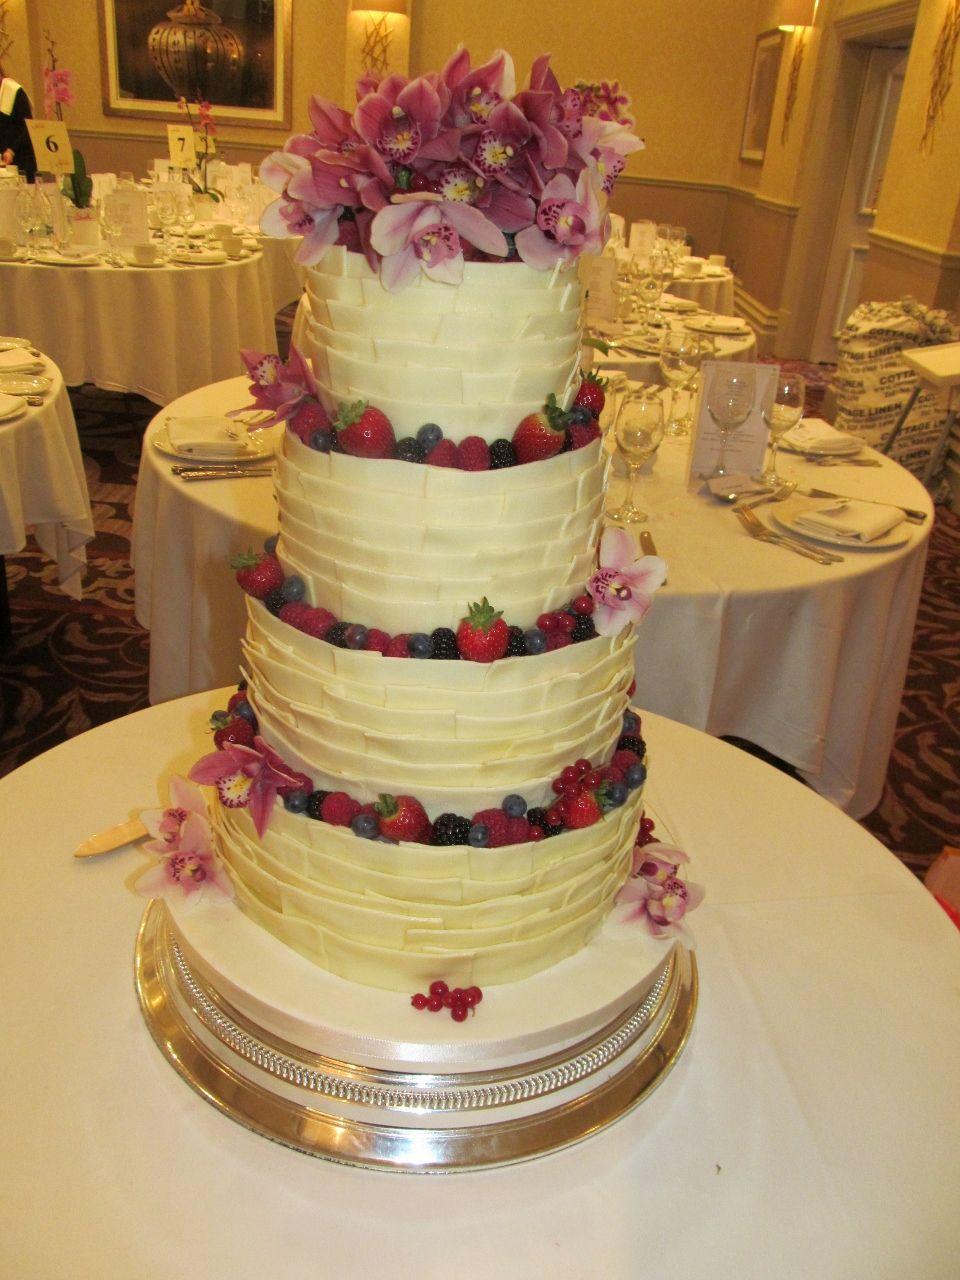 White Chocolate Wedding Cake Recipe - Wedding Cake Flavors